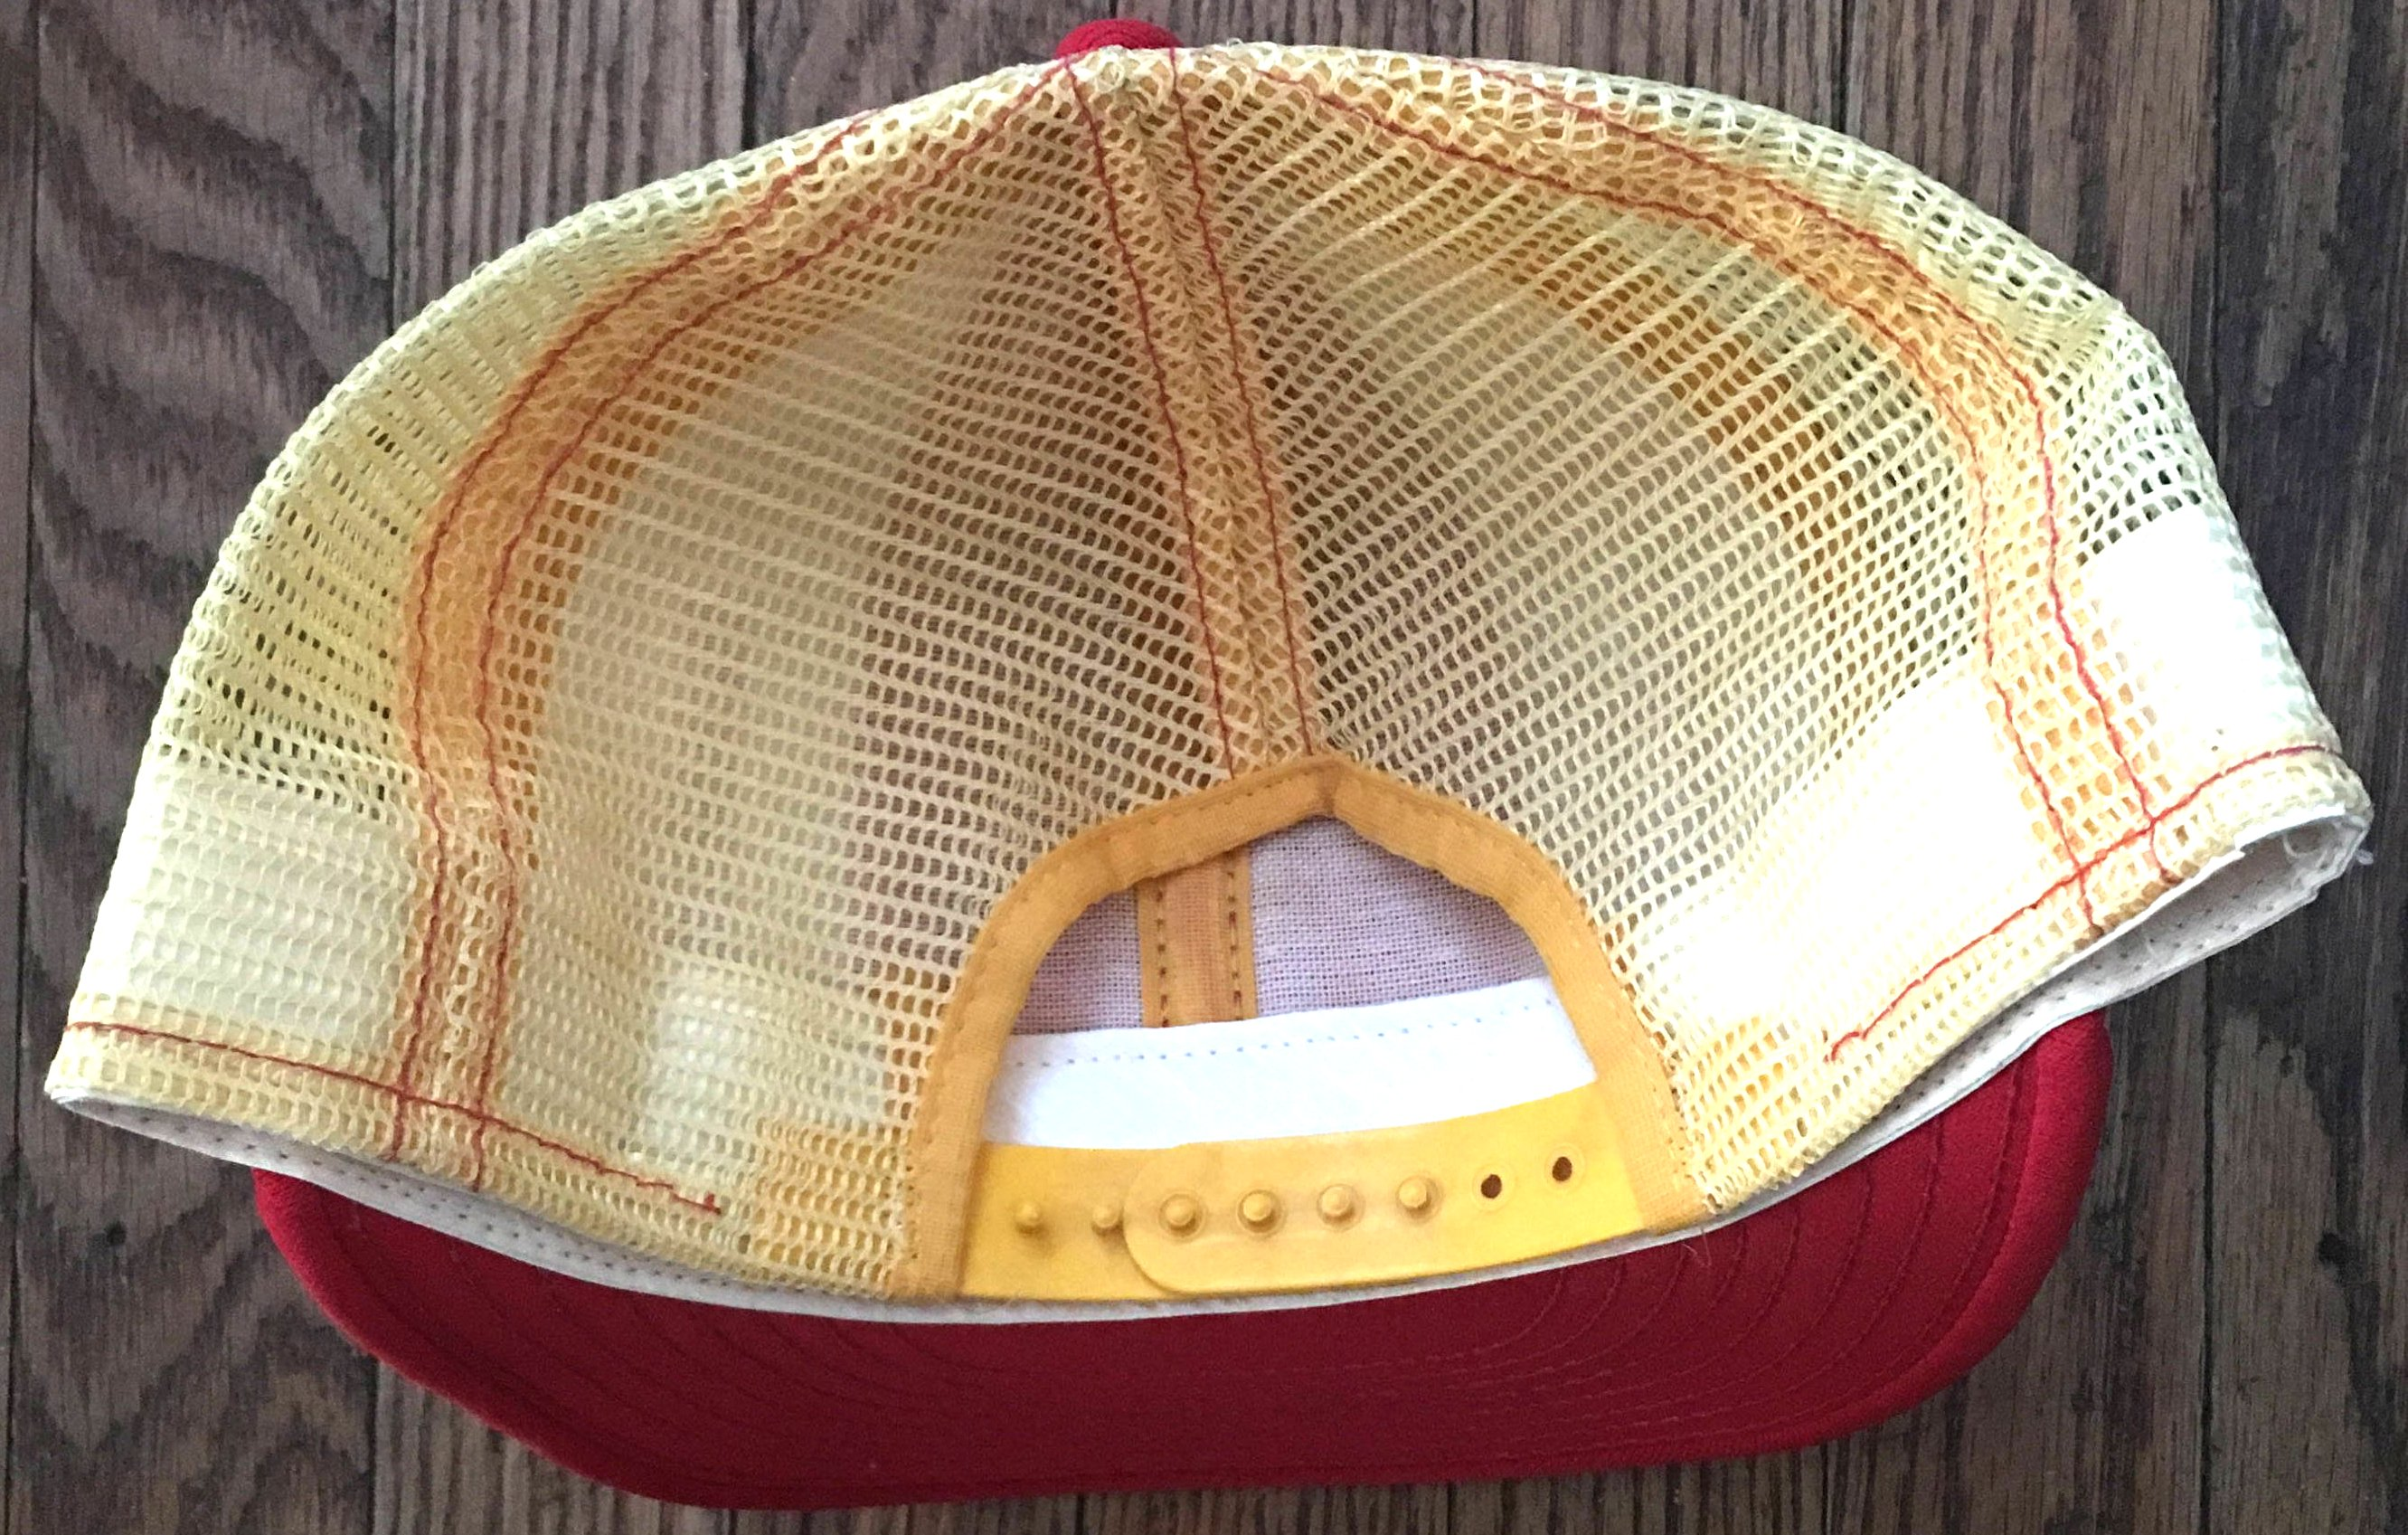 215413fc7 NFL Vintage San Francisco 49ers Super Bowl XIX Snap Back Hat ...